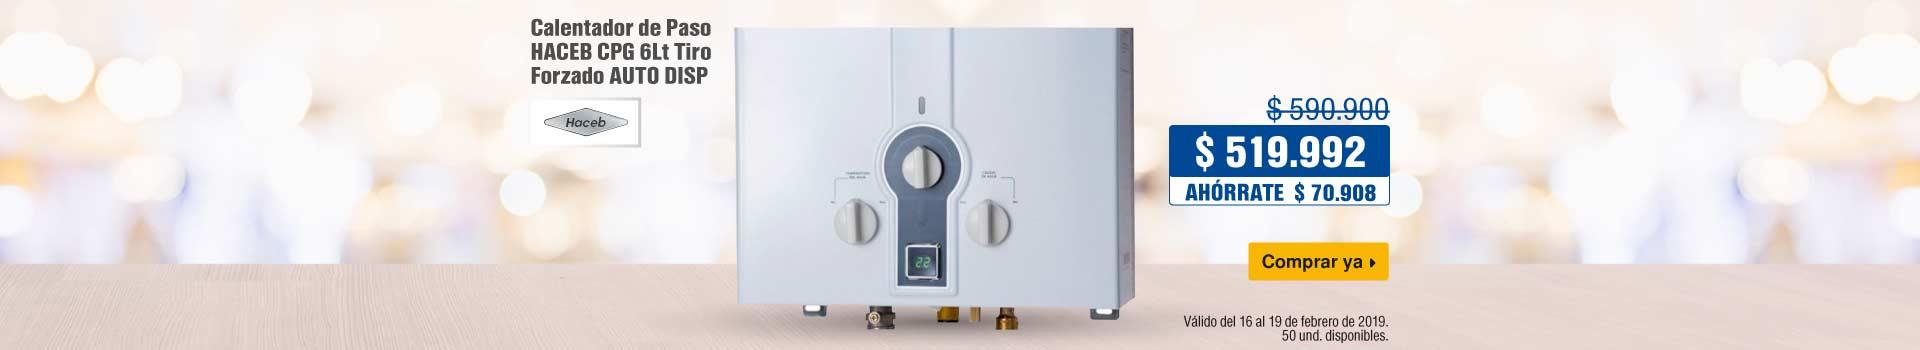 AK-KT-mayores-2-ELECT-BCAT-calentadores-150219